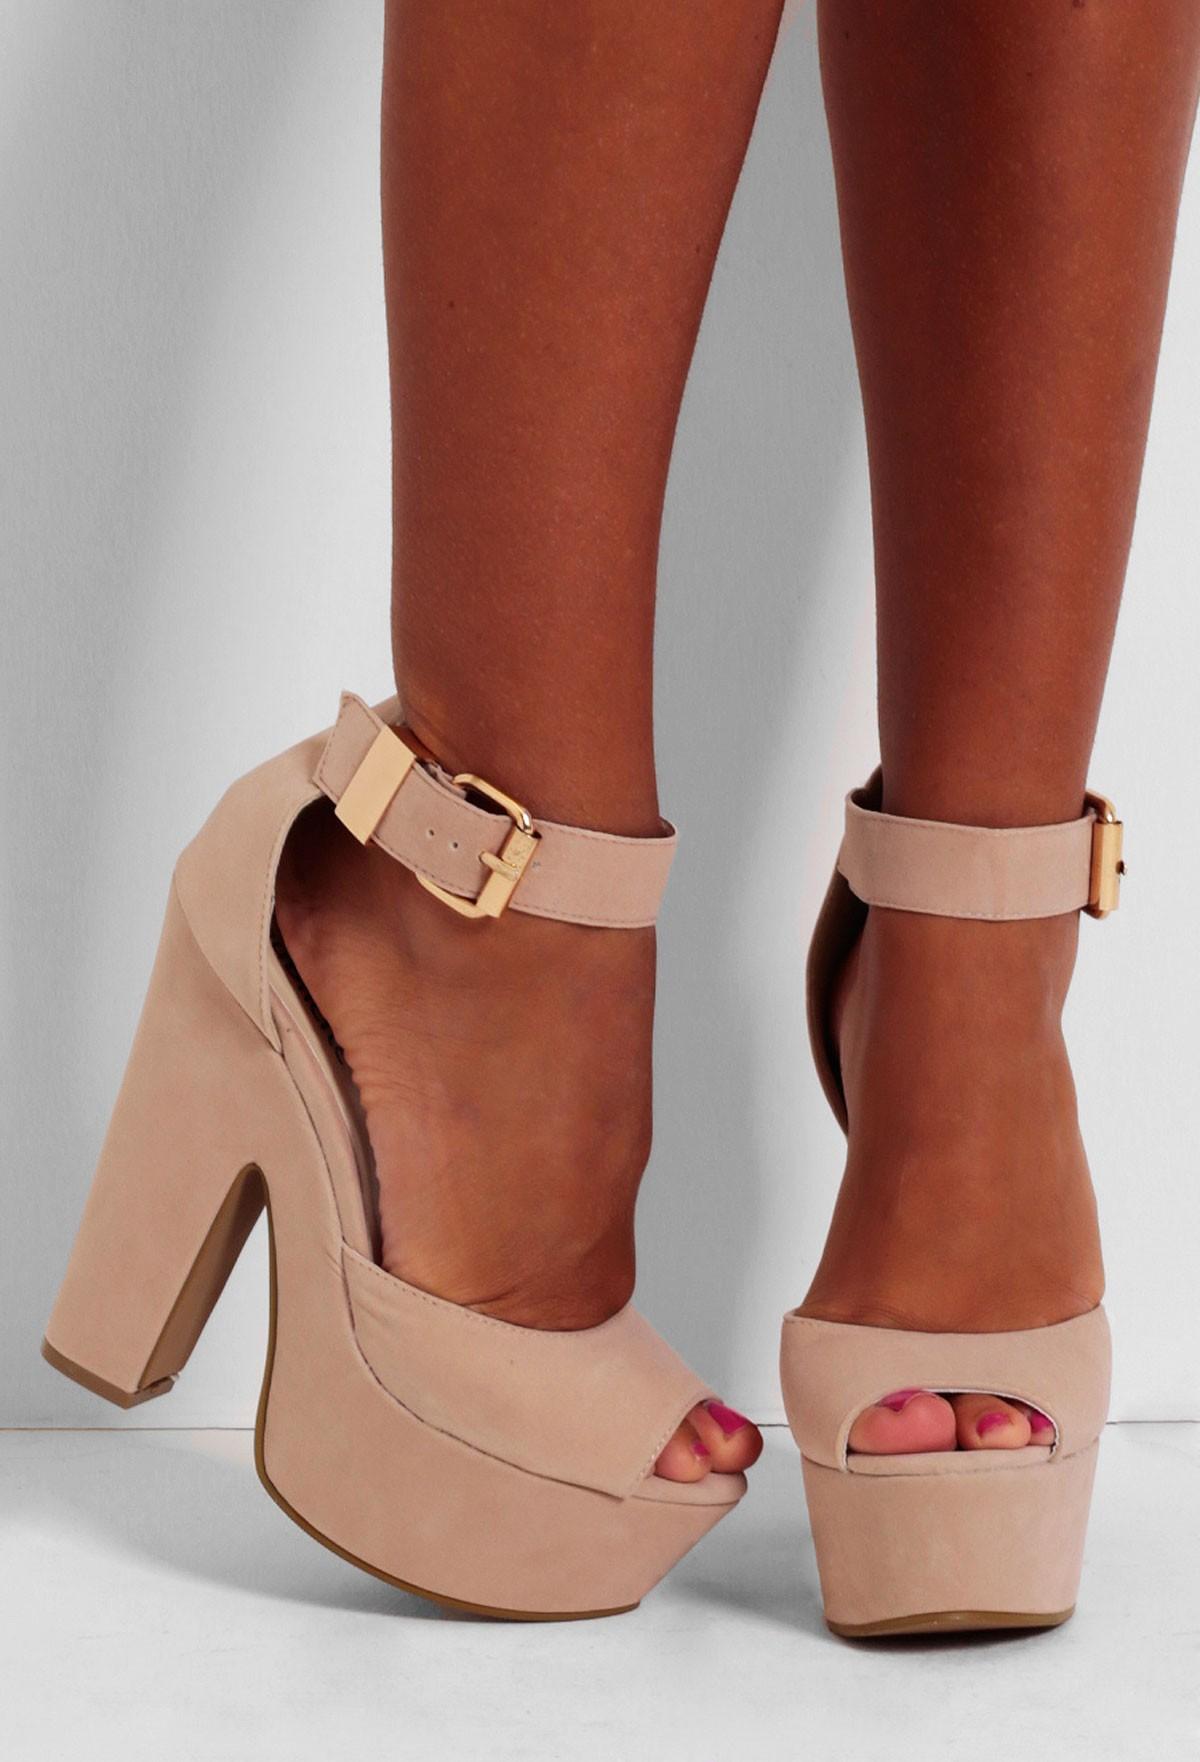 Nude Platform Shoes 90